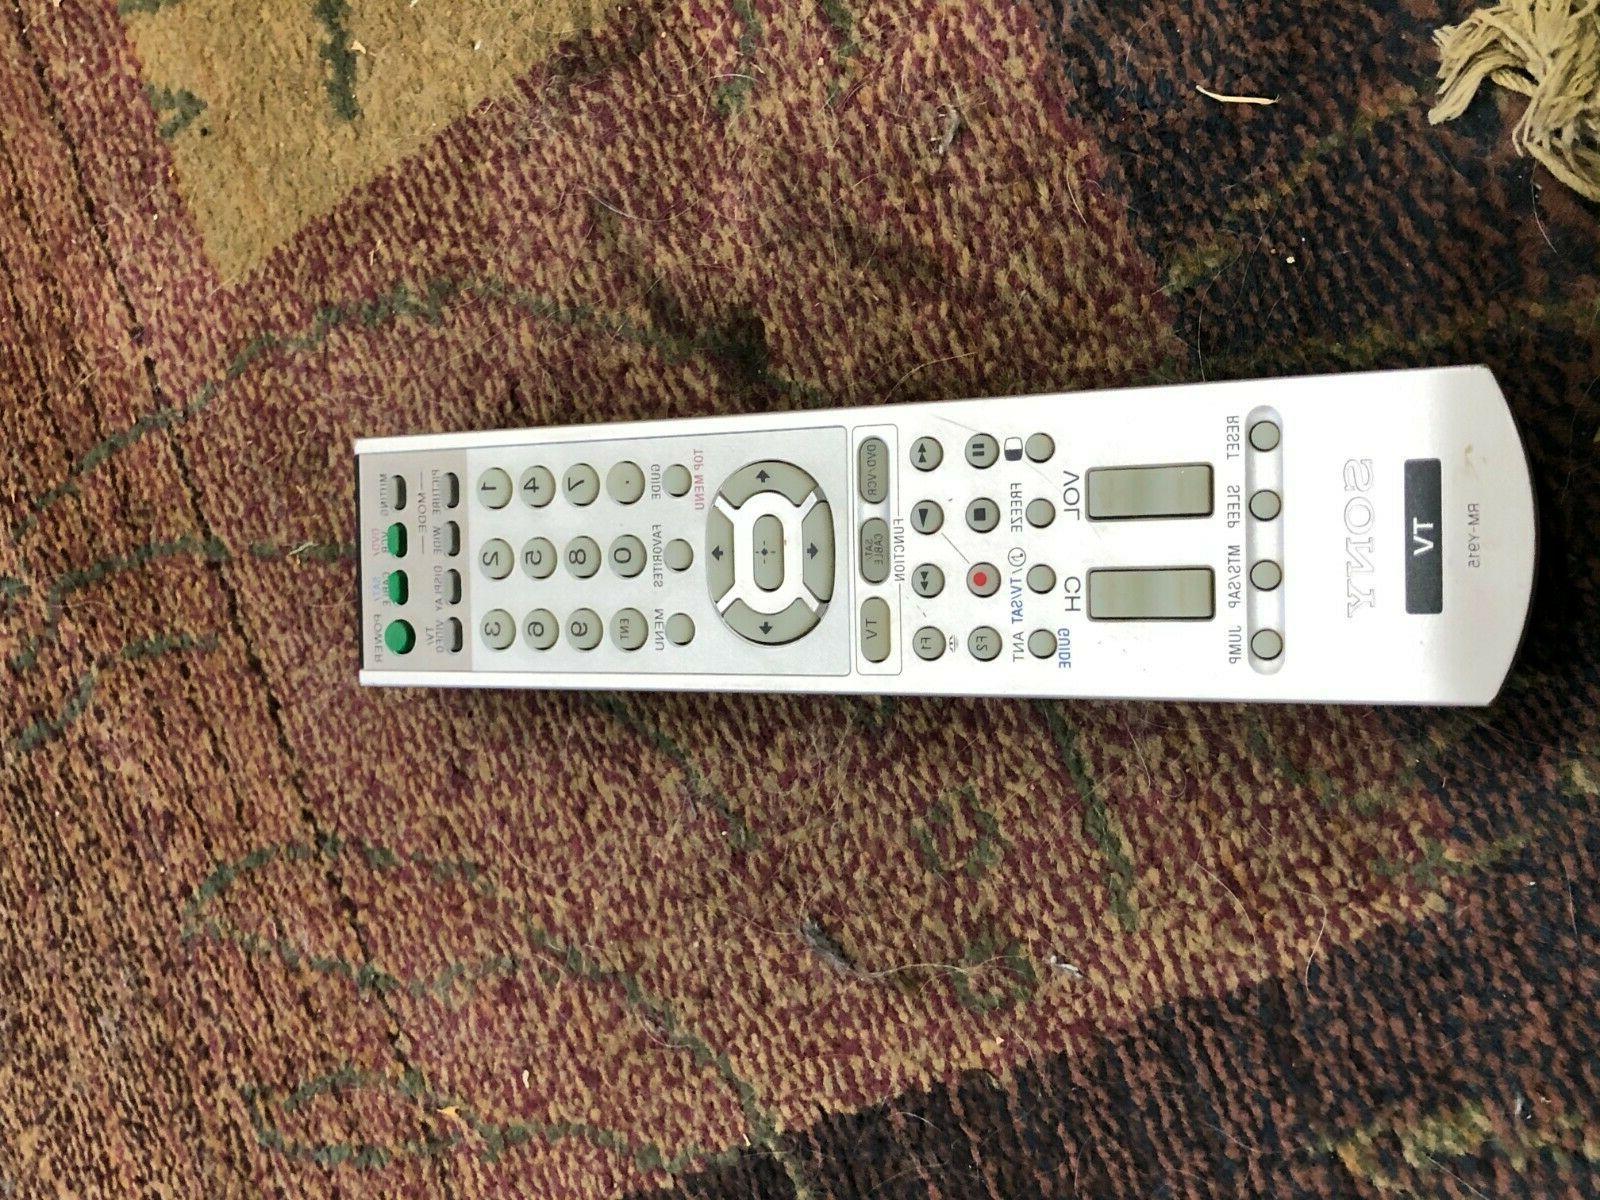 "60"" KDF-60XS955 REAR-PROJECTION LCD TV"